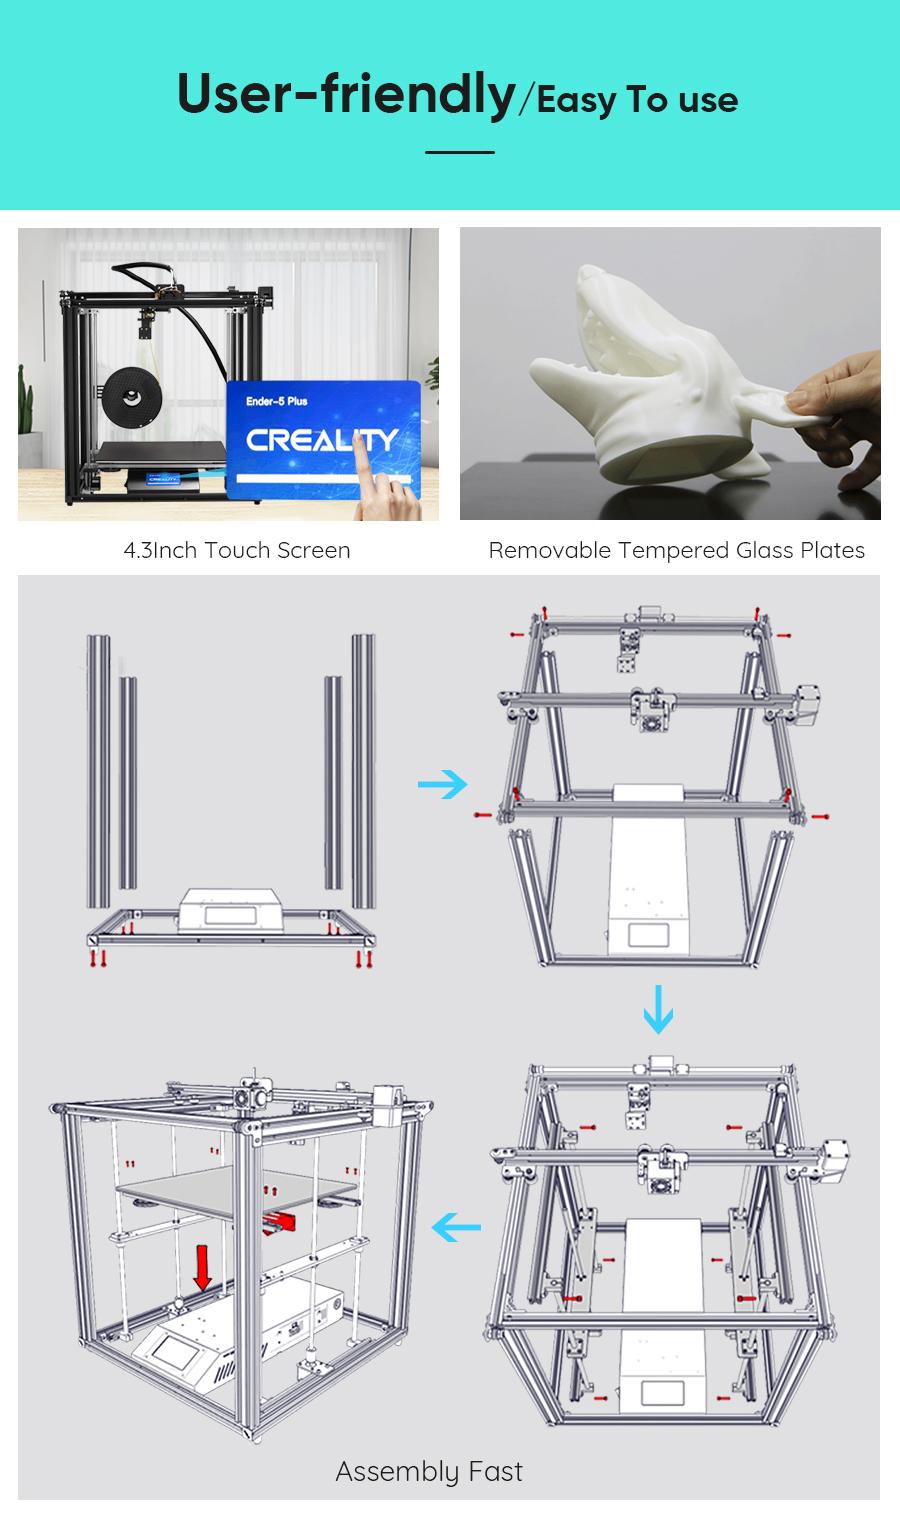 Creality Ender 5 Plus 3D Printer